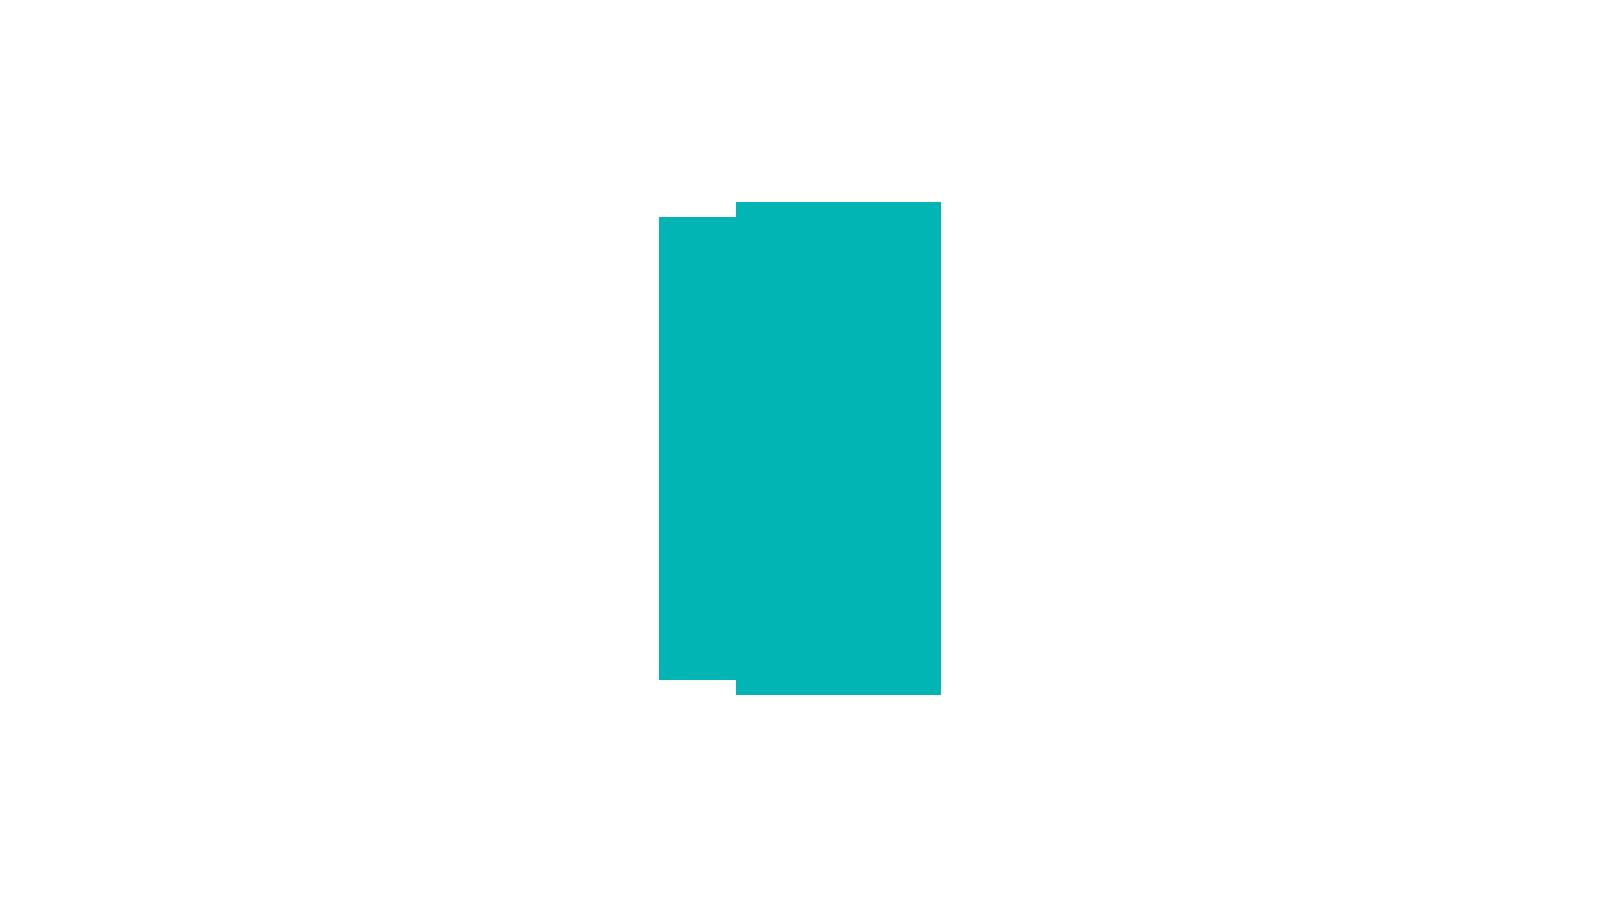 epub Zivilgesellschaft in Subsahara Afrika 2014